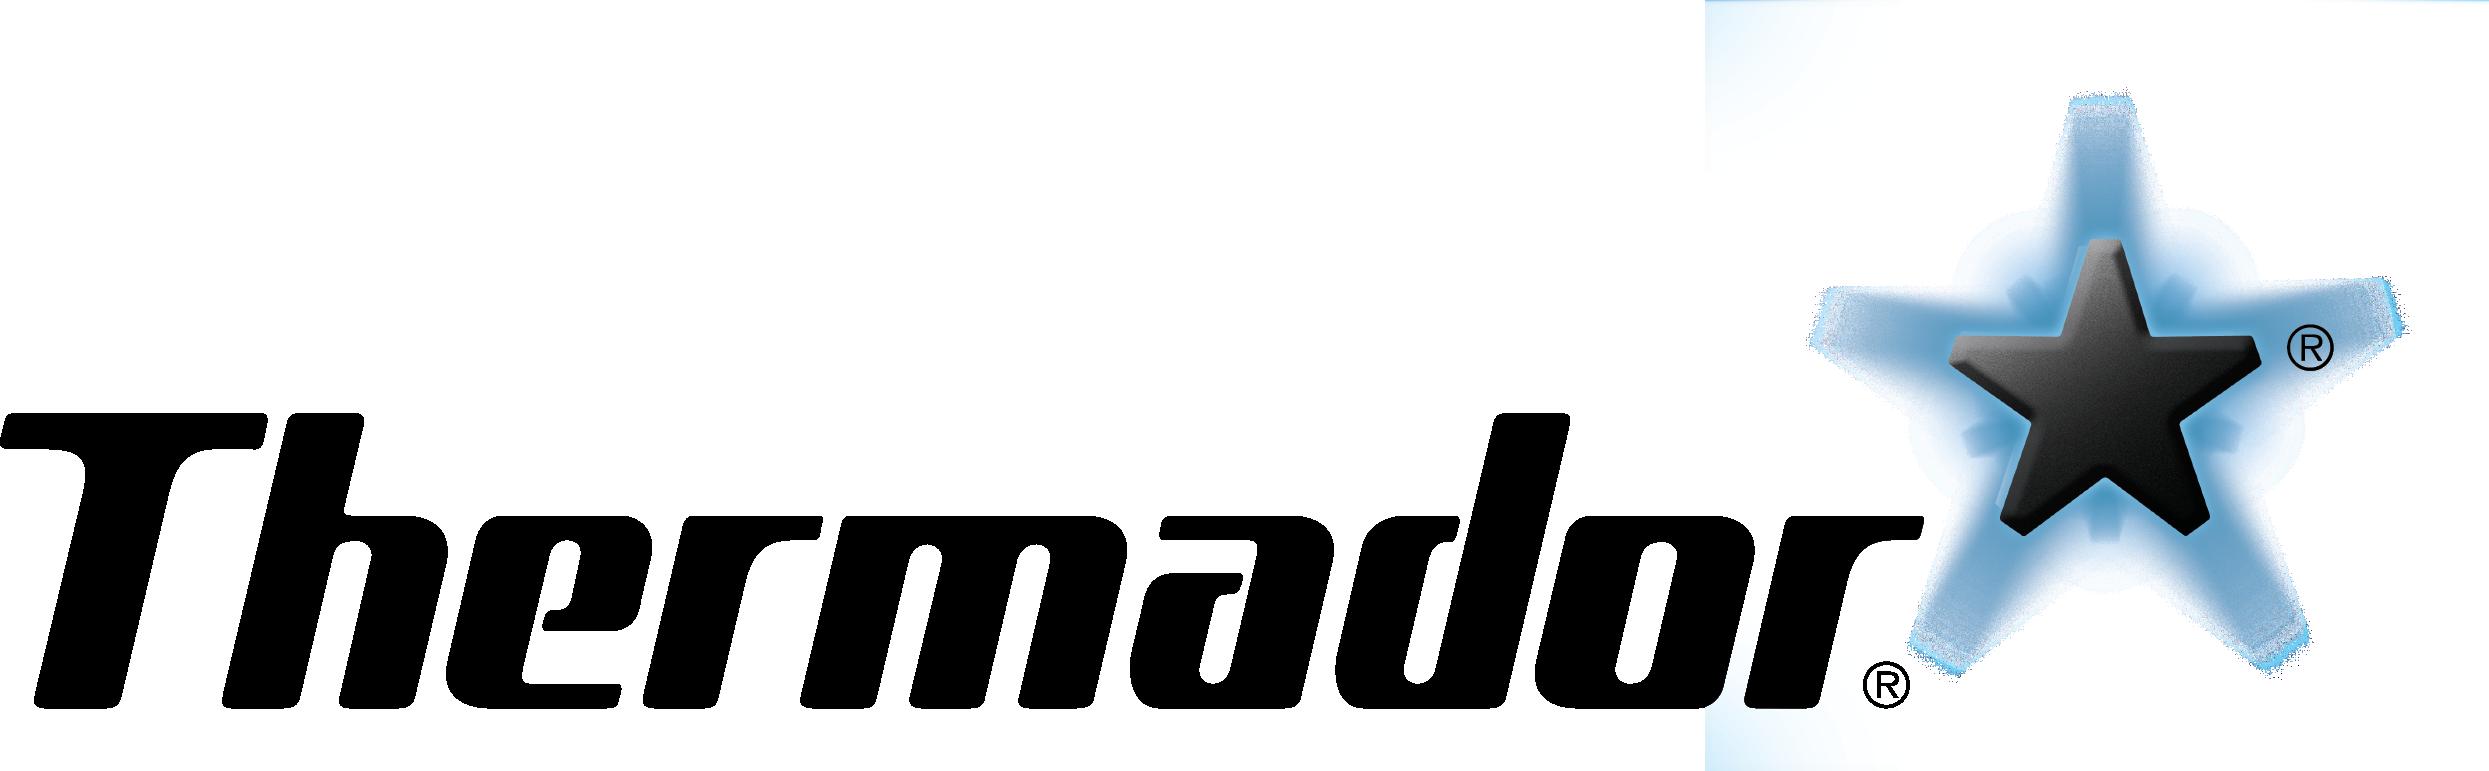 Bosch Logo Transparent - Thermador Logo (2489x771), Png Download